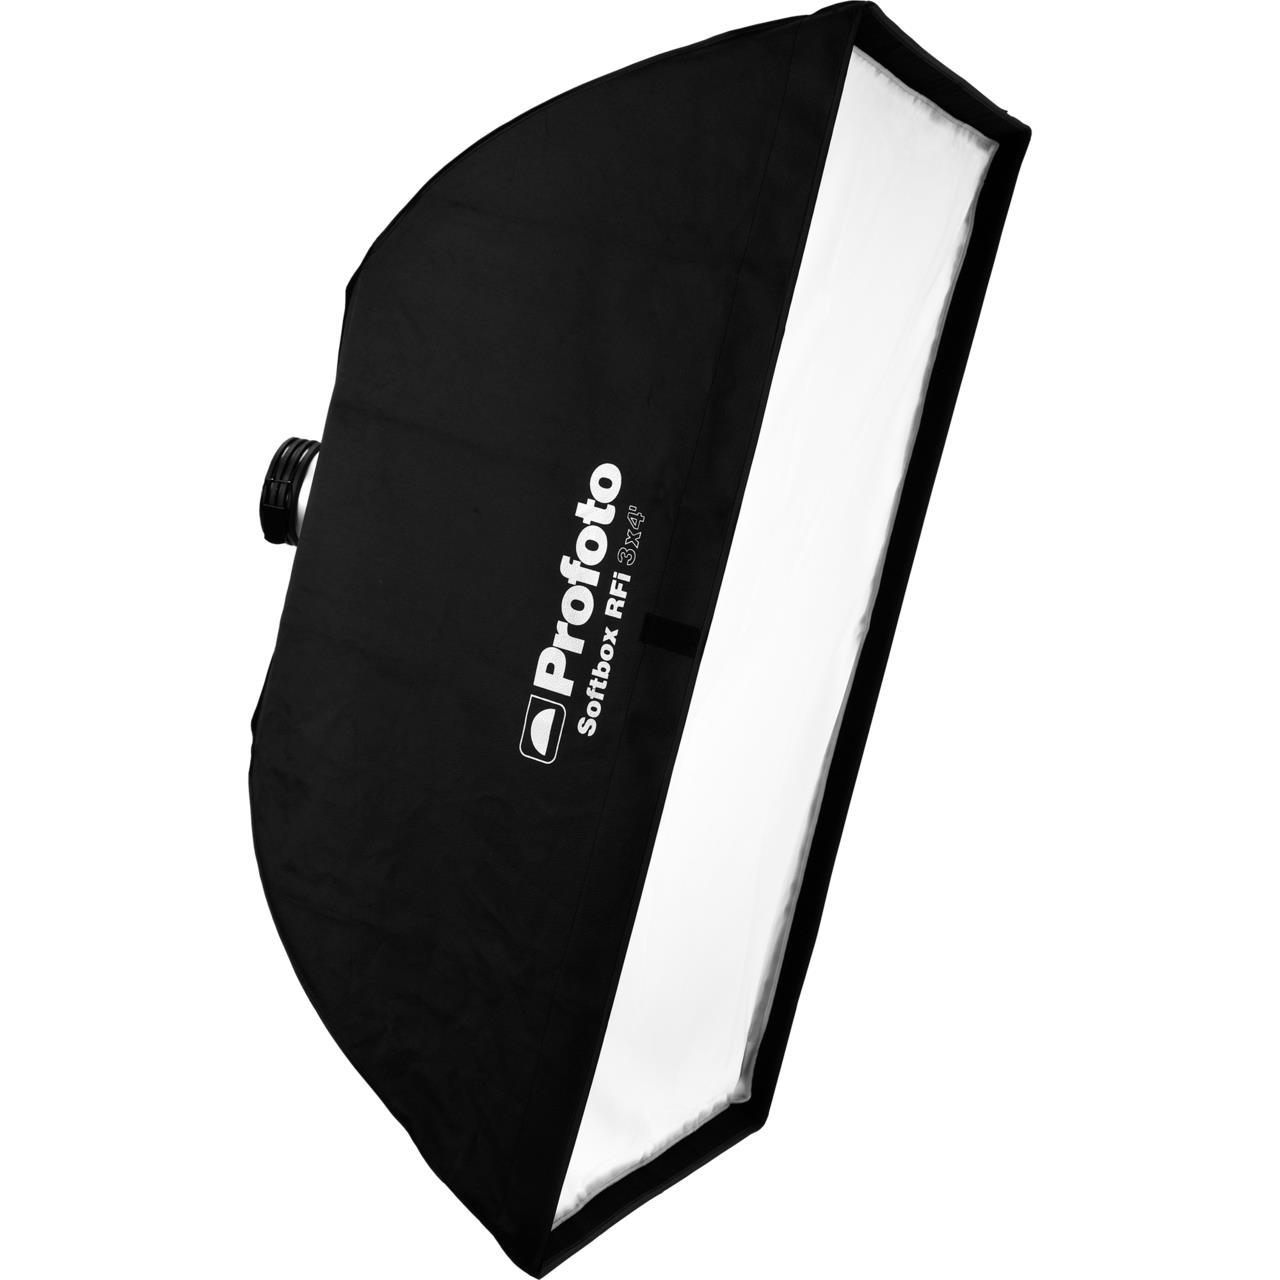 Profoto 3x4 Softbox - Profoto Softbox RFi 3x4´ m/ speedringPris: 120,- eks. mva